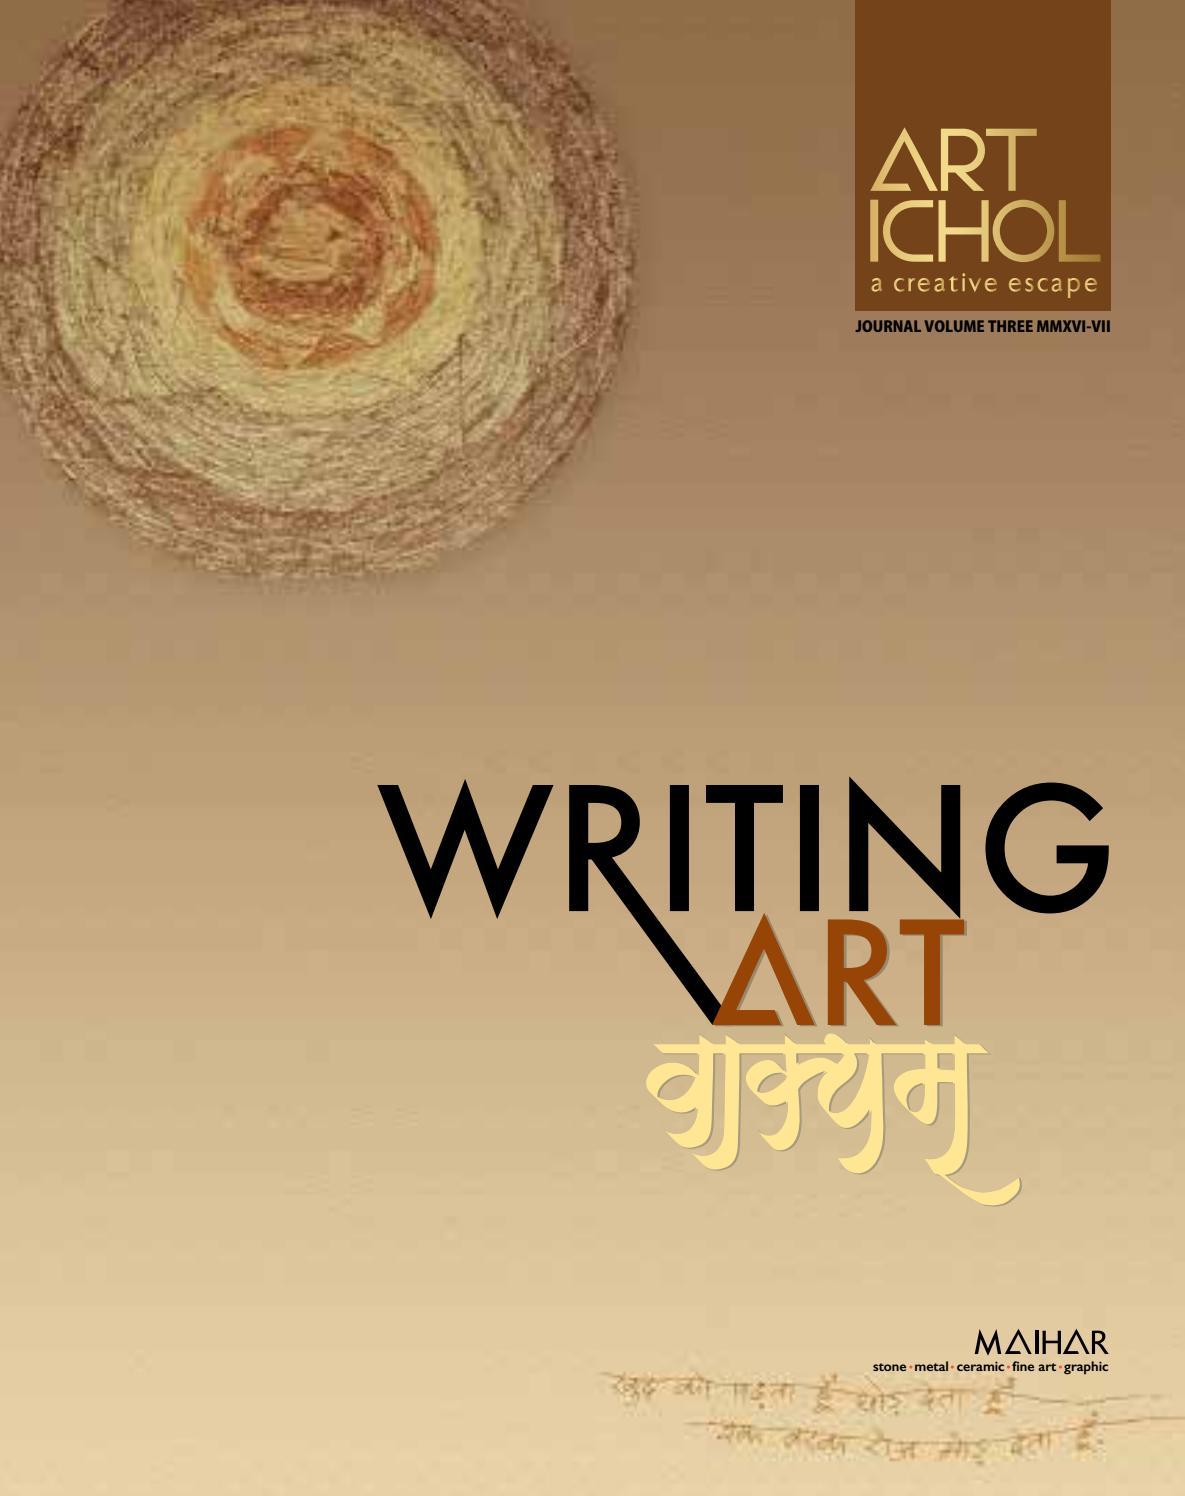 ART ICHOL Journal 3rd Volume by Gallery Sanskriti - issuu